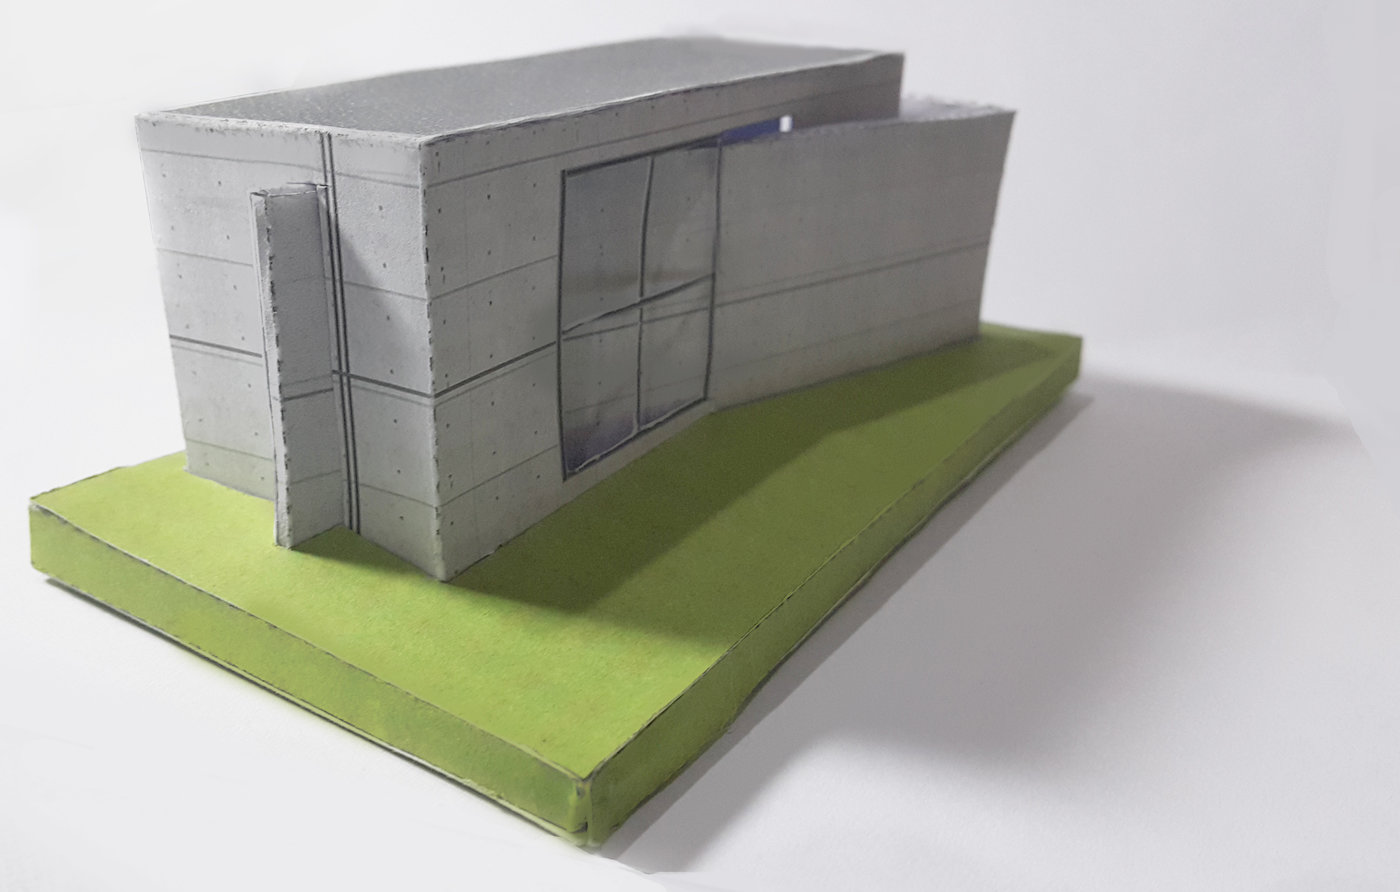 Papercraft : Church of Light by Randy Gunawan at Coroflot com